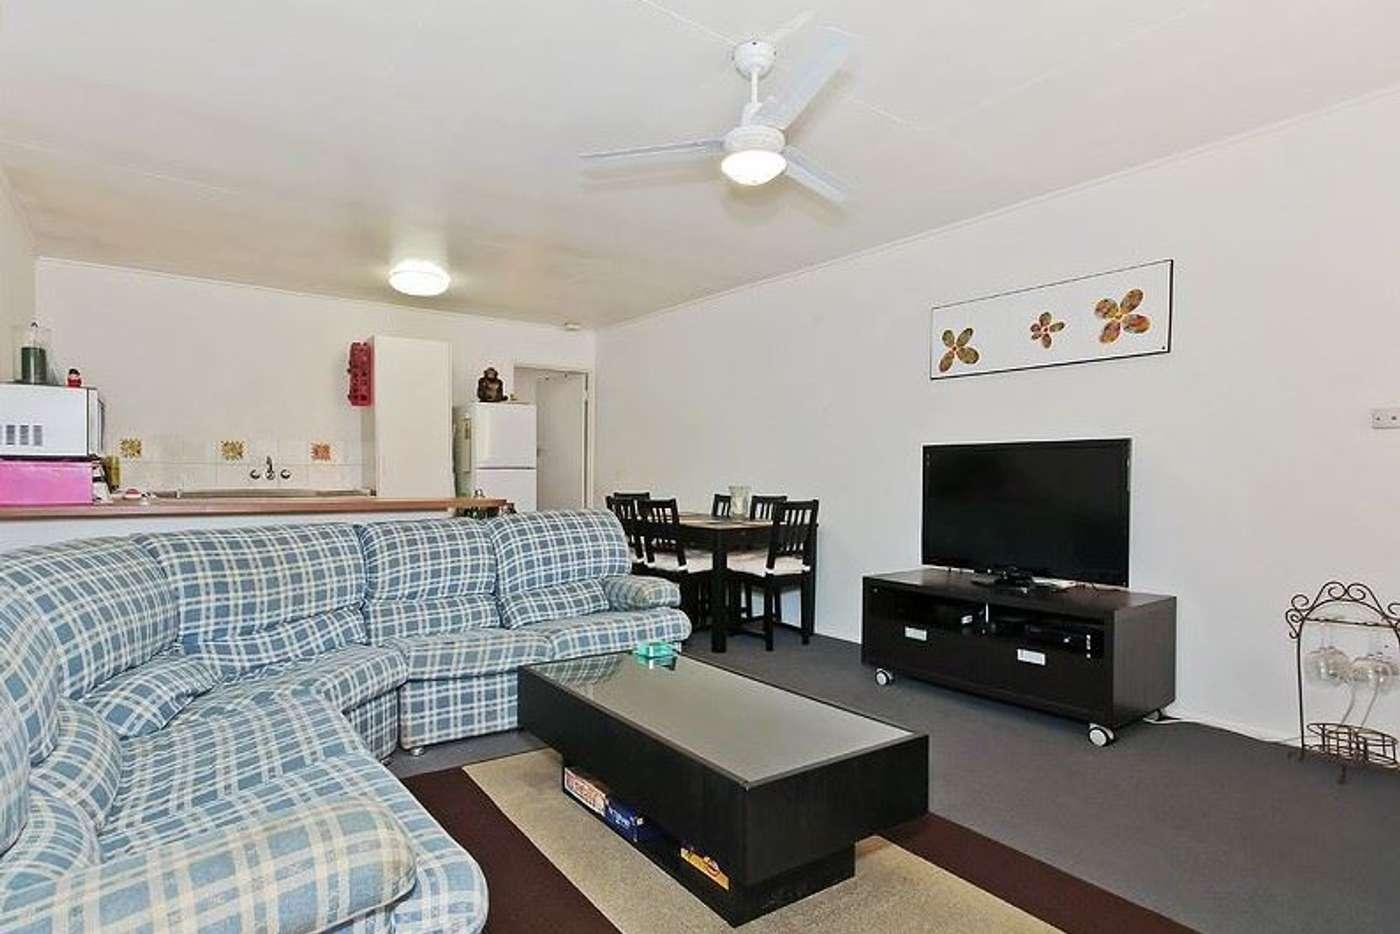 Main view of Homely unit listing, 4/19 Hopetoun Street, Ascot QLD 4007